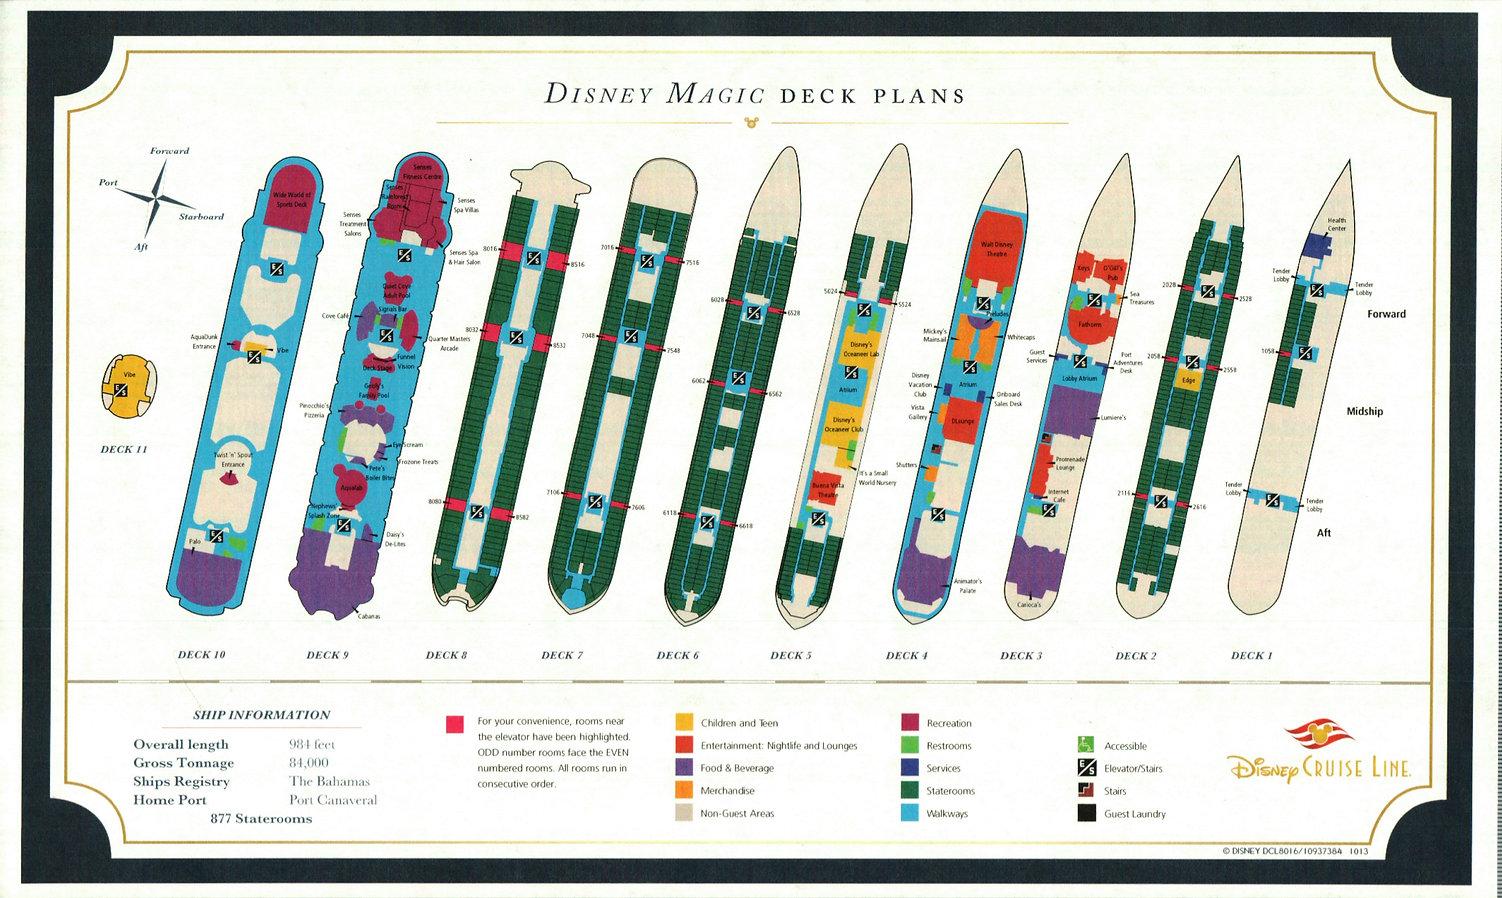 Disney-Magic-Deck-Plan-Handout.jpg